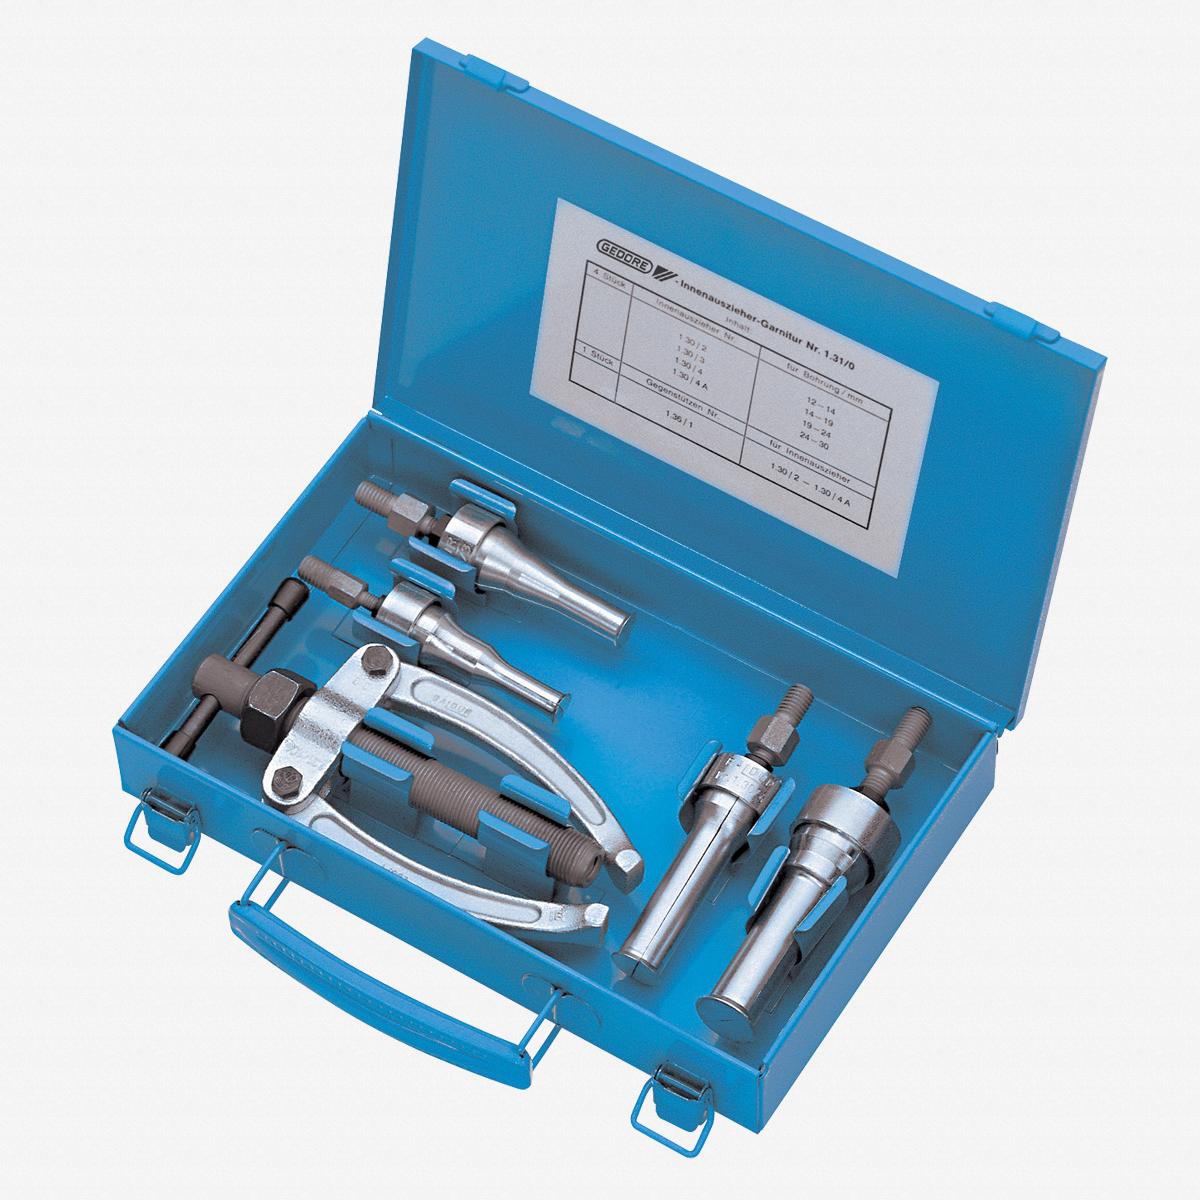 Gedore 1.31/0 Internal extractor set - KC Tool